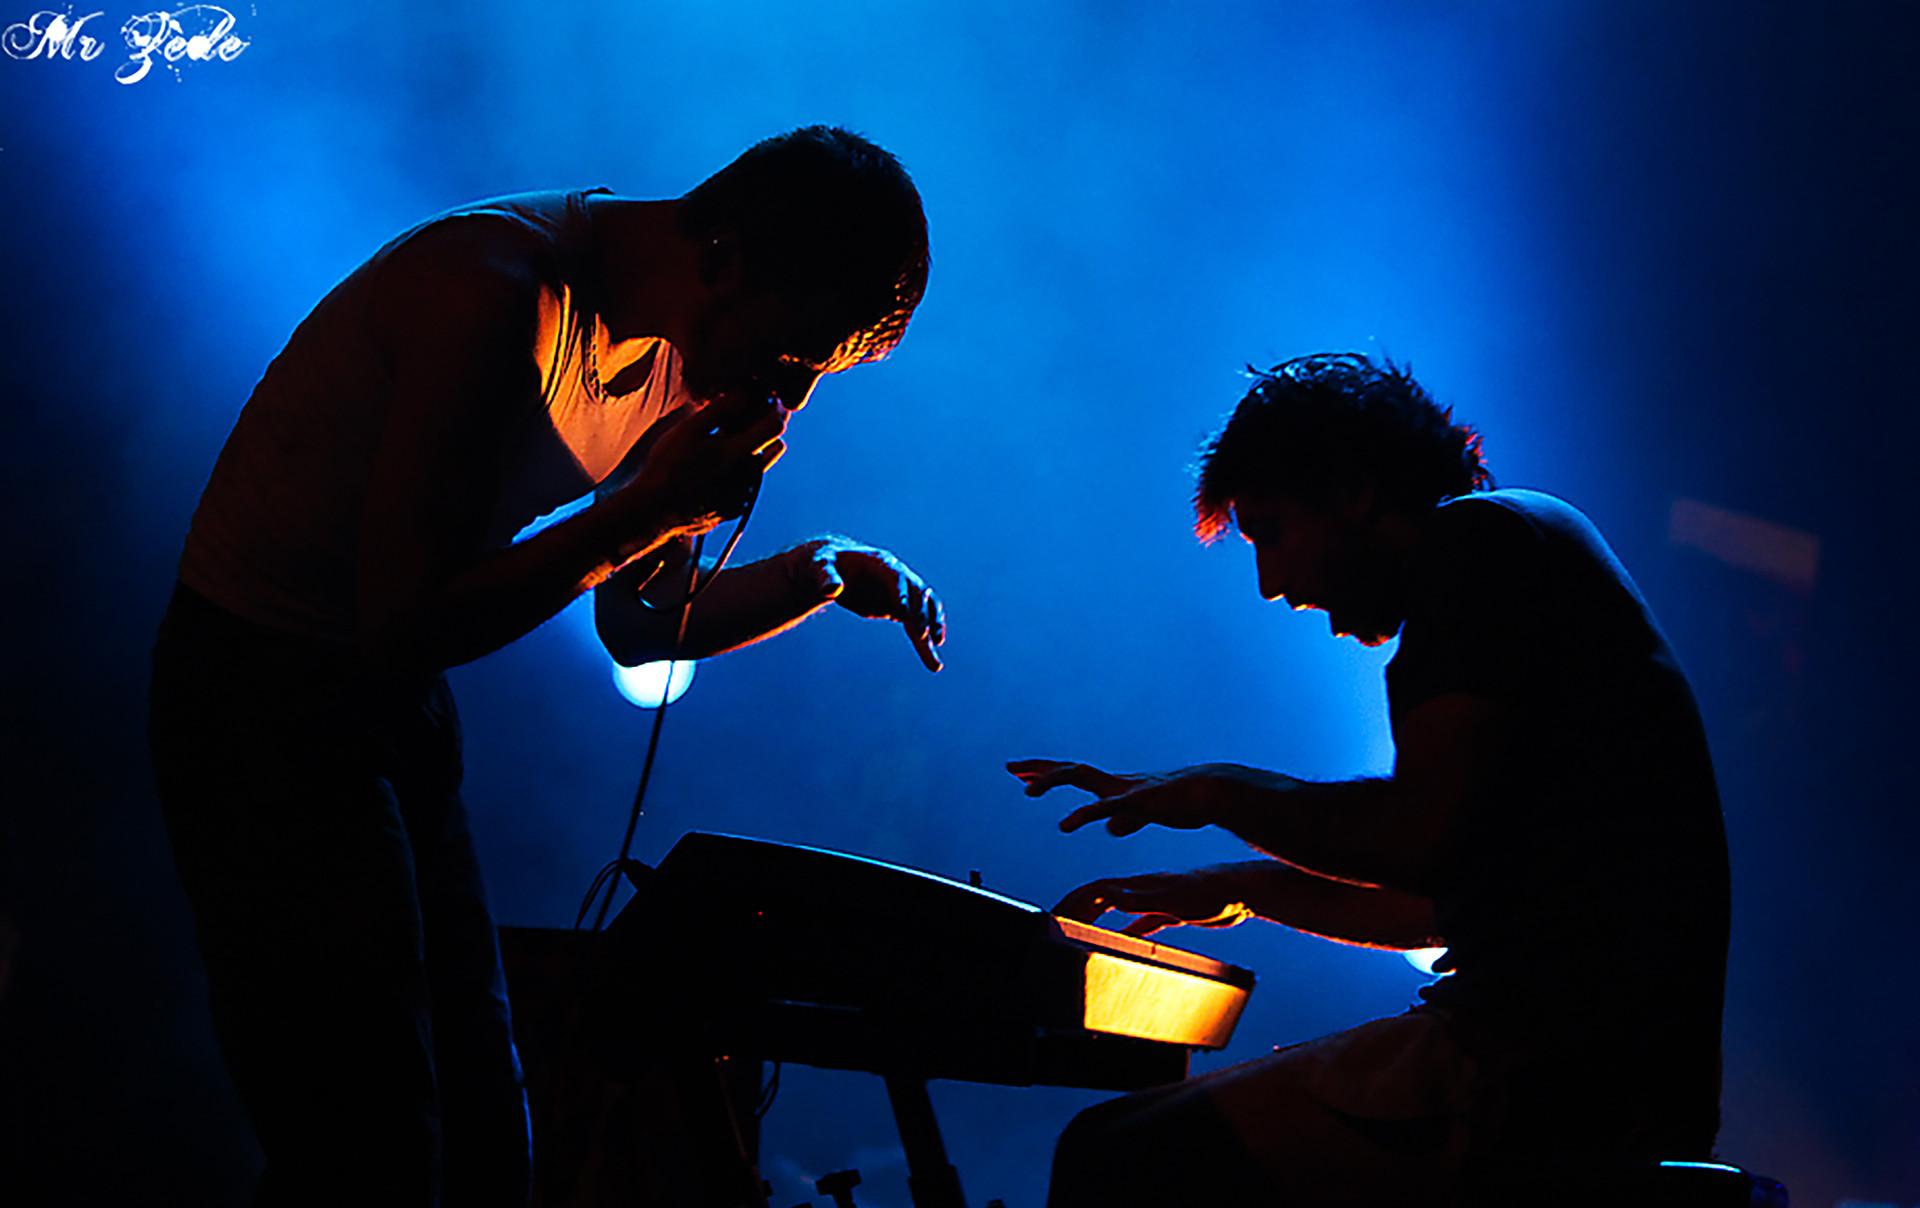 Kertone Production - Jerkov Musiques - My Own Private Alaska (MOPA) - Matthieu Miegeville (Milka) - Tristan Mocquet - Photo Live Concert